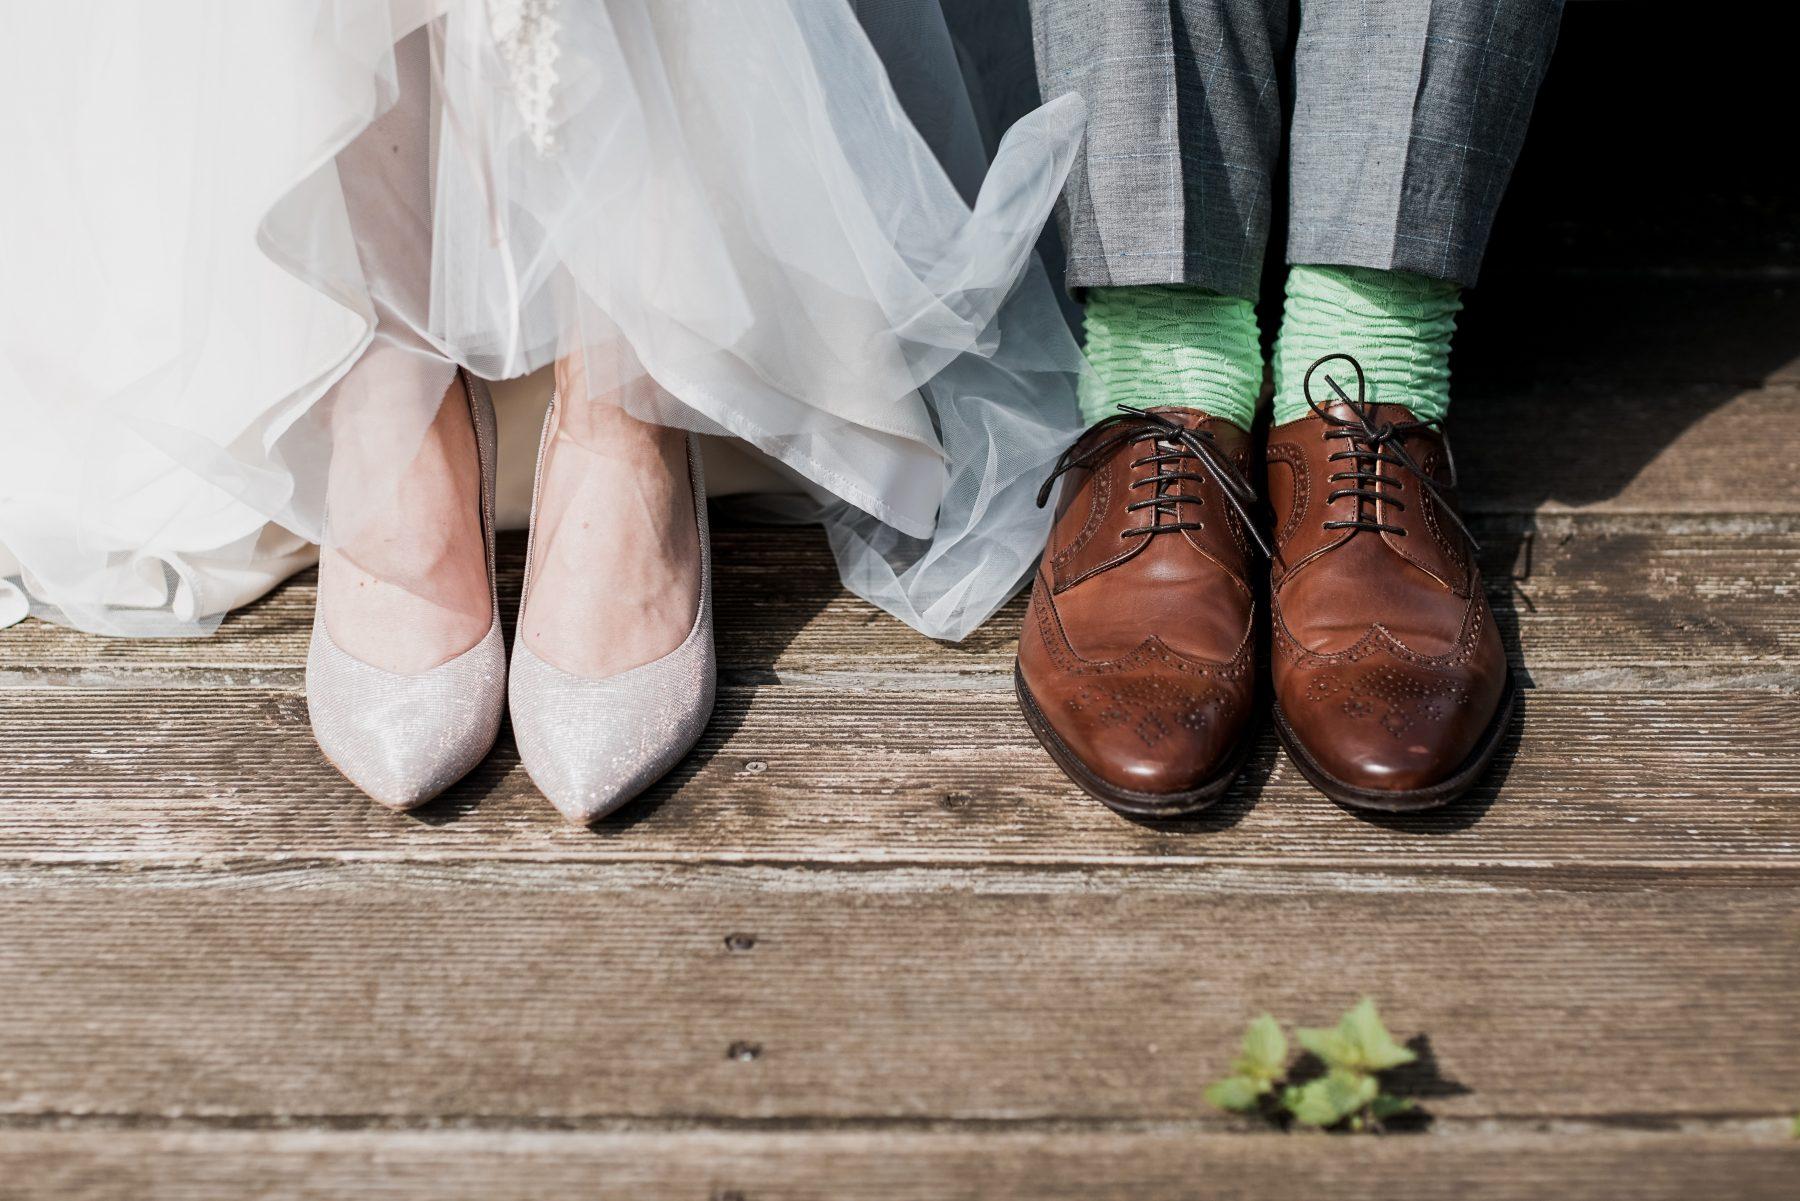 moeder en dochter trouwen samen